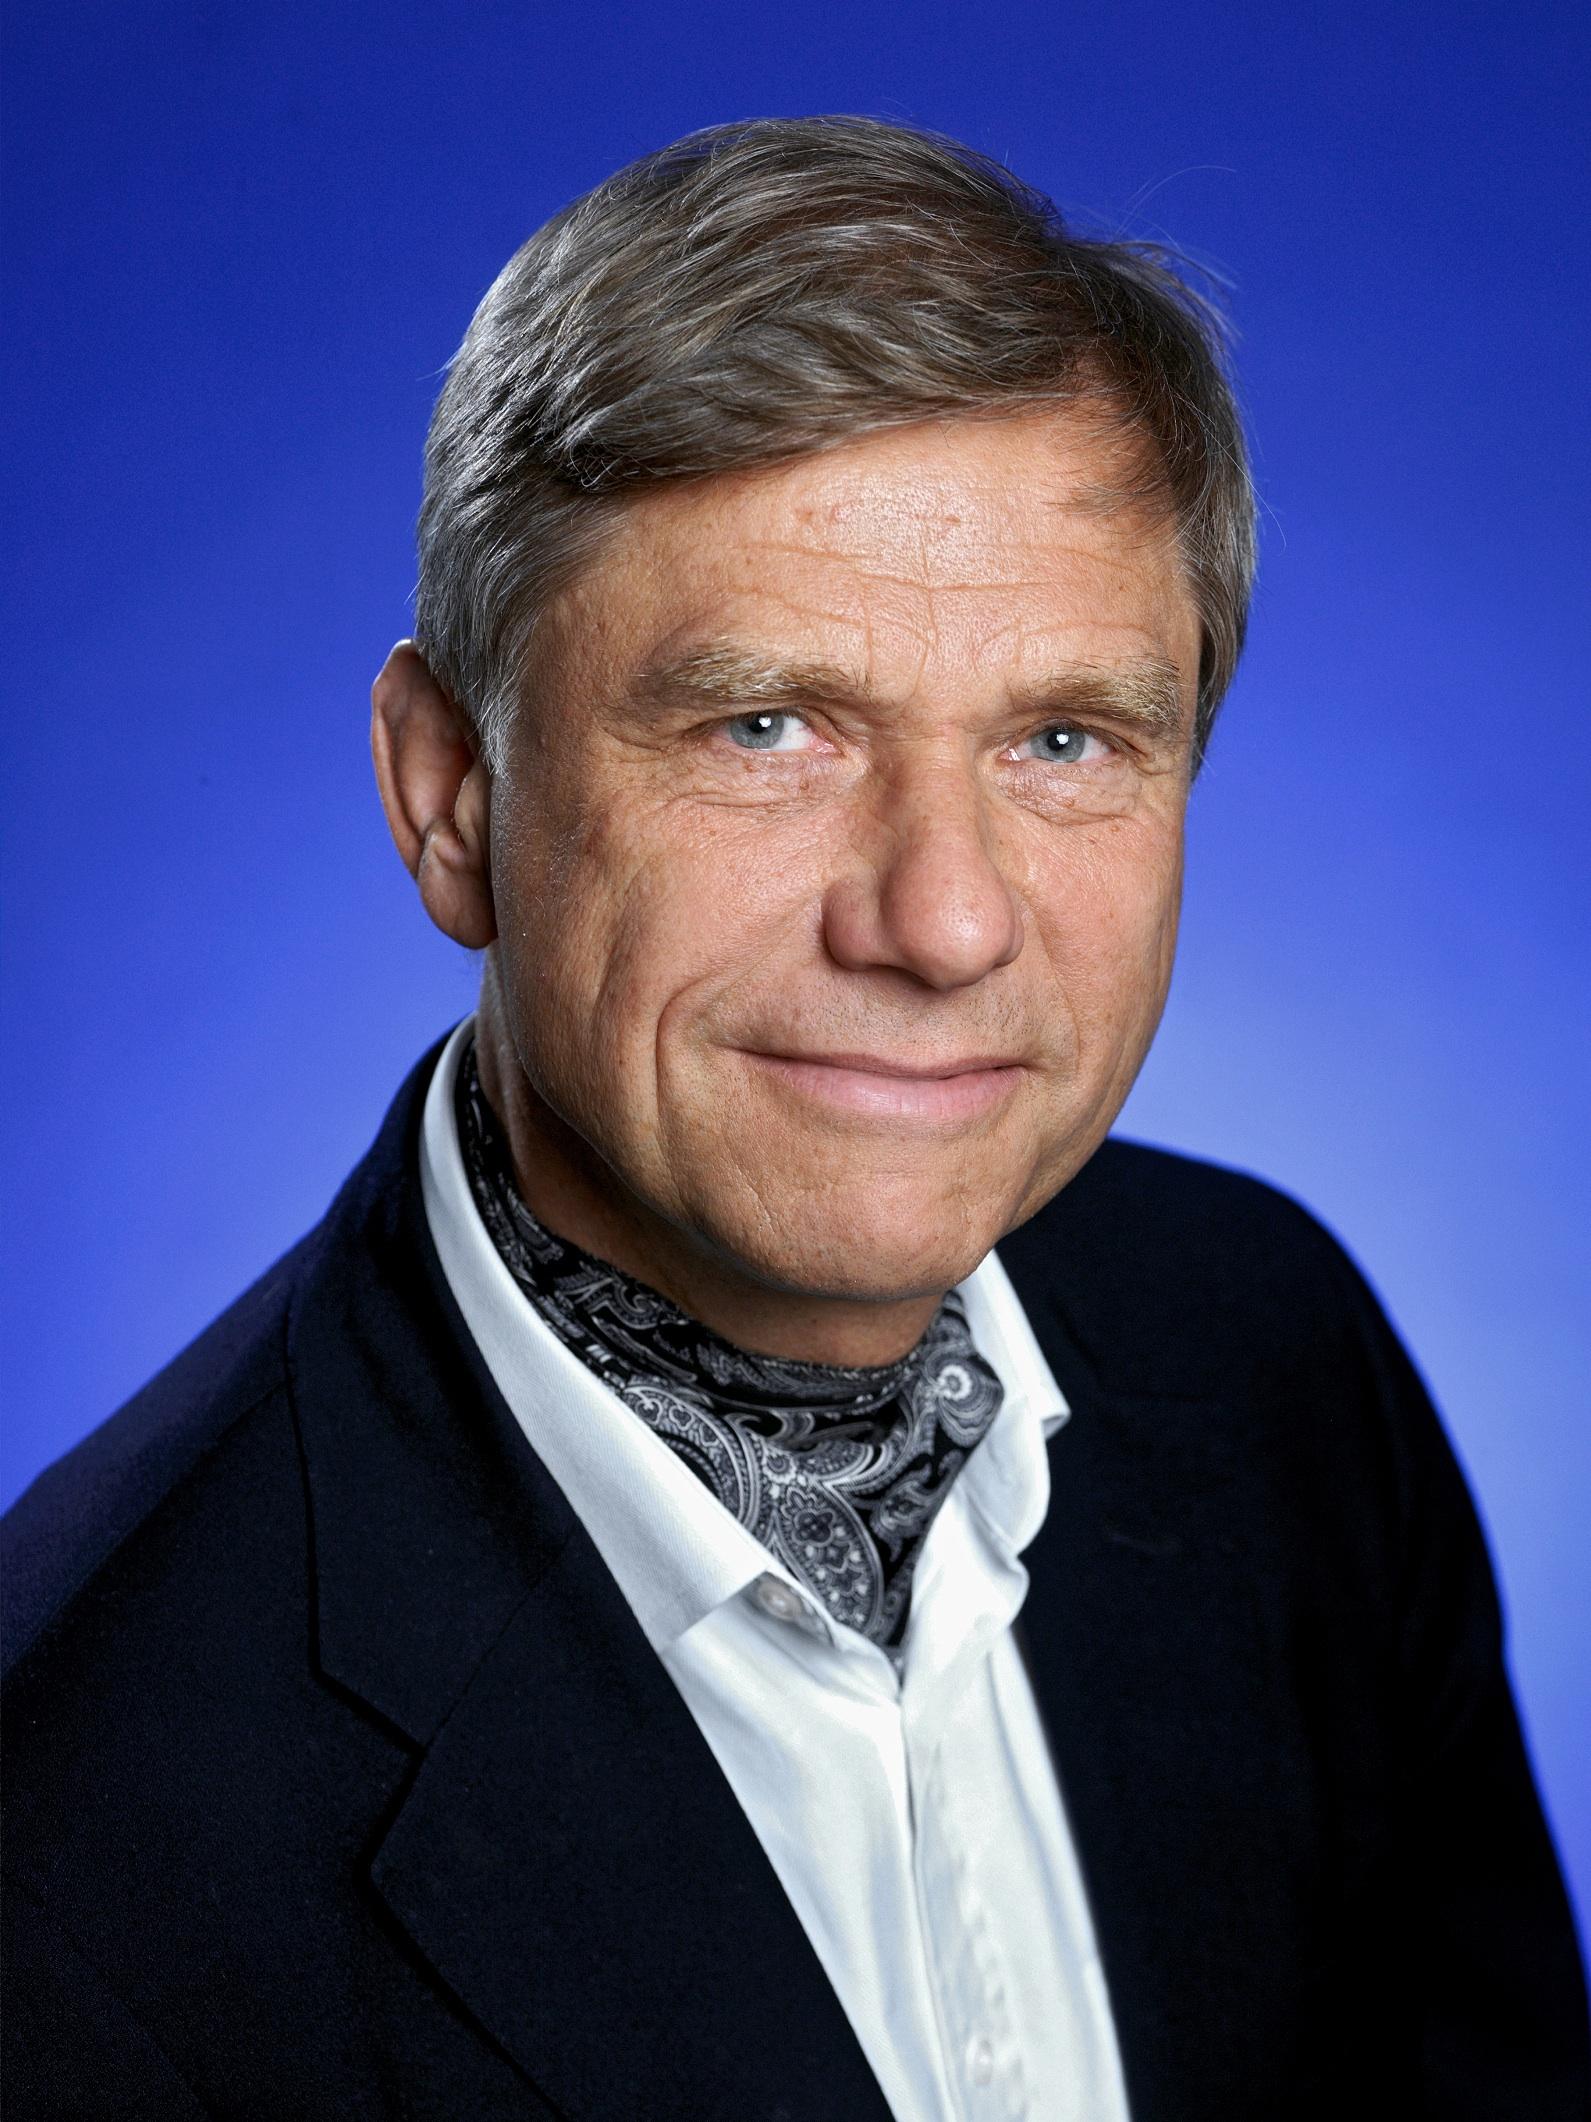 Hermann Hauser, Technology entrepreneur and venture capitalist